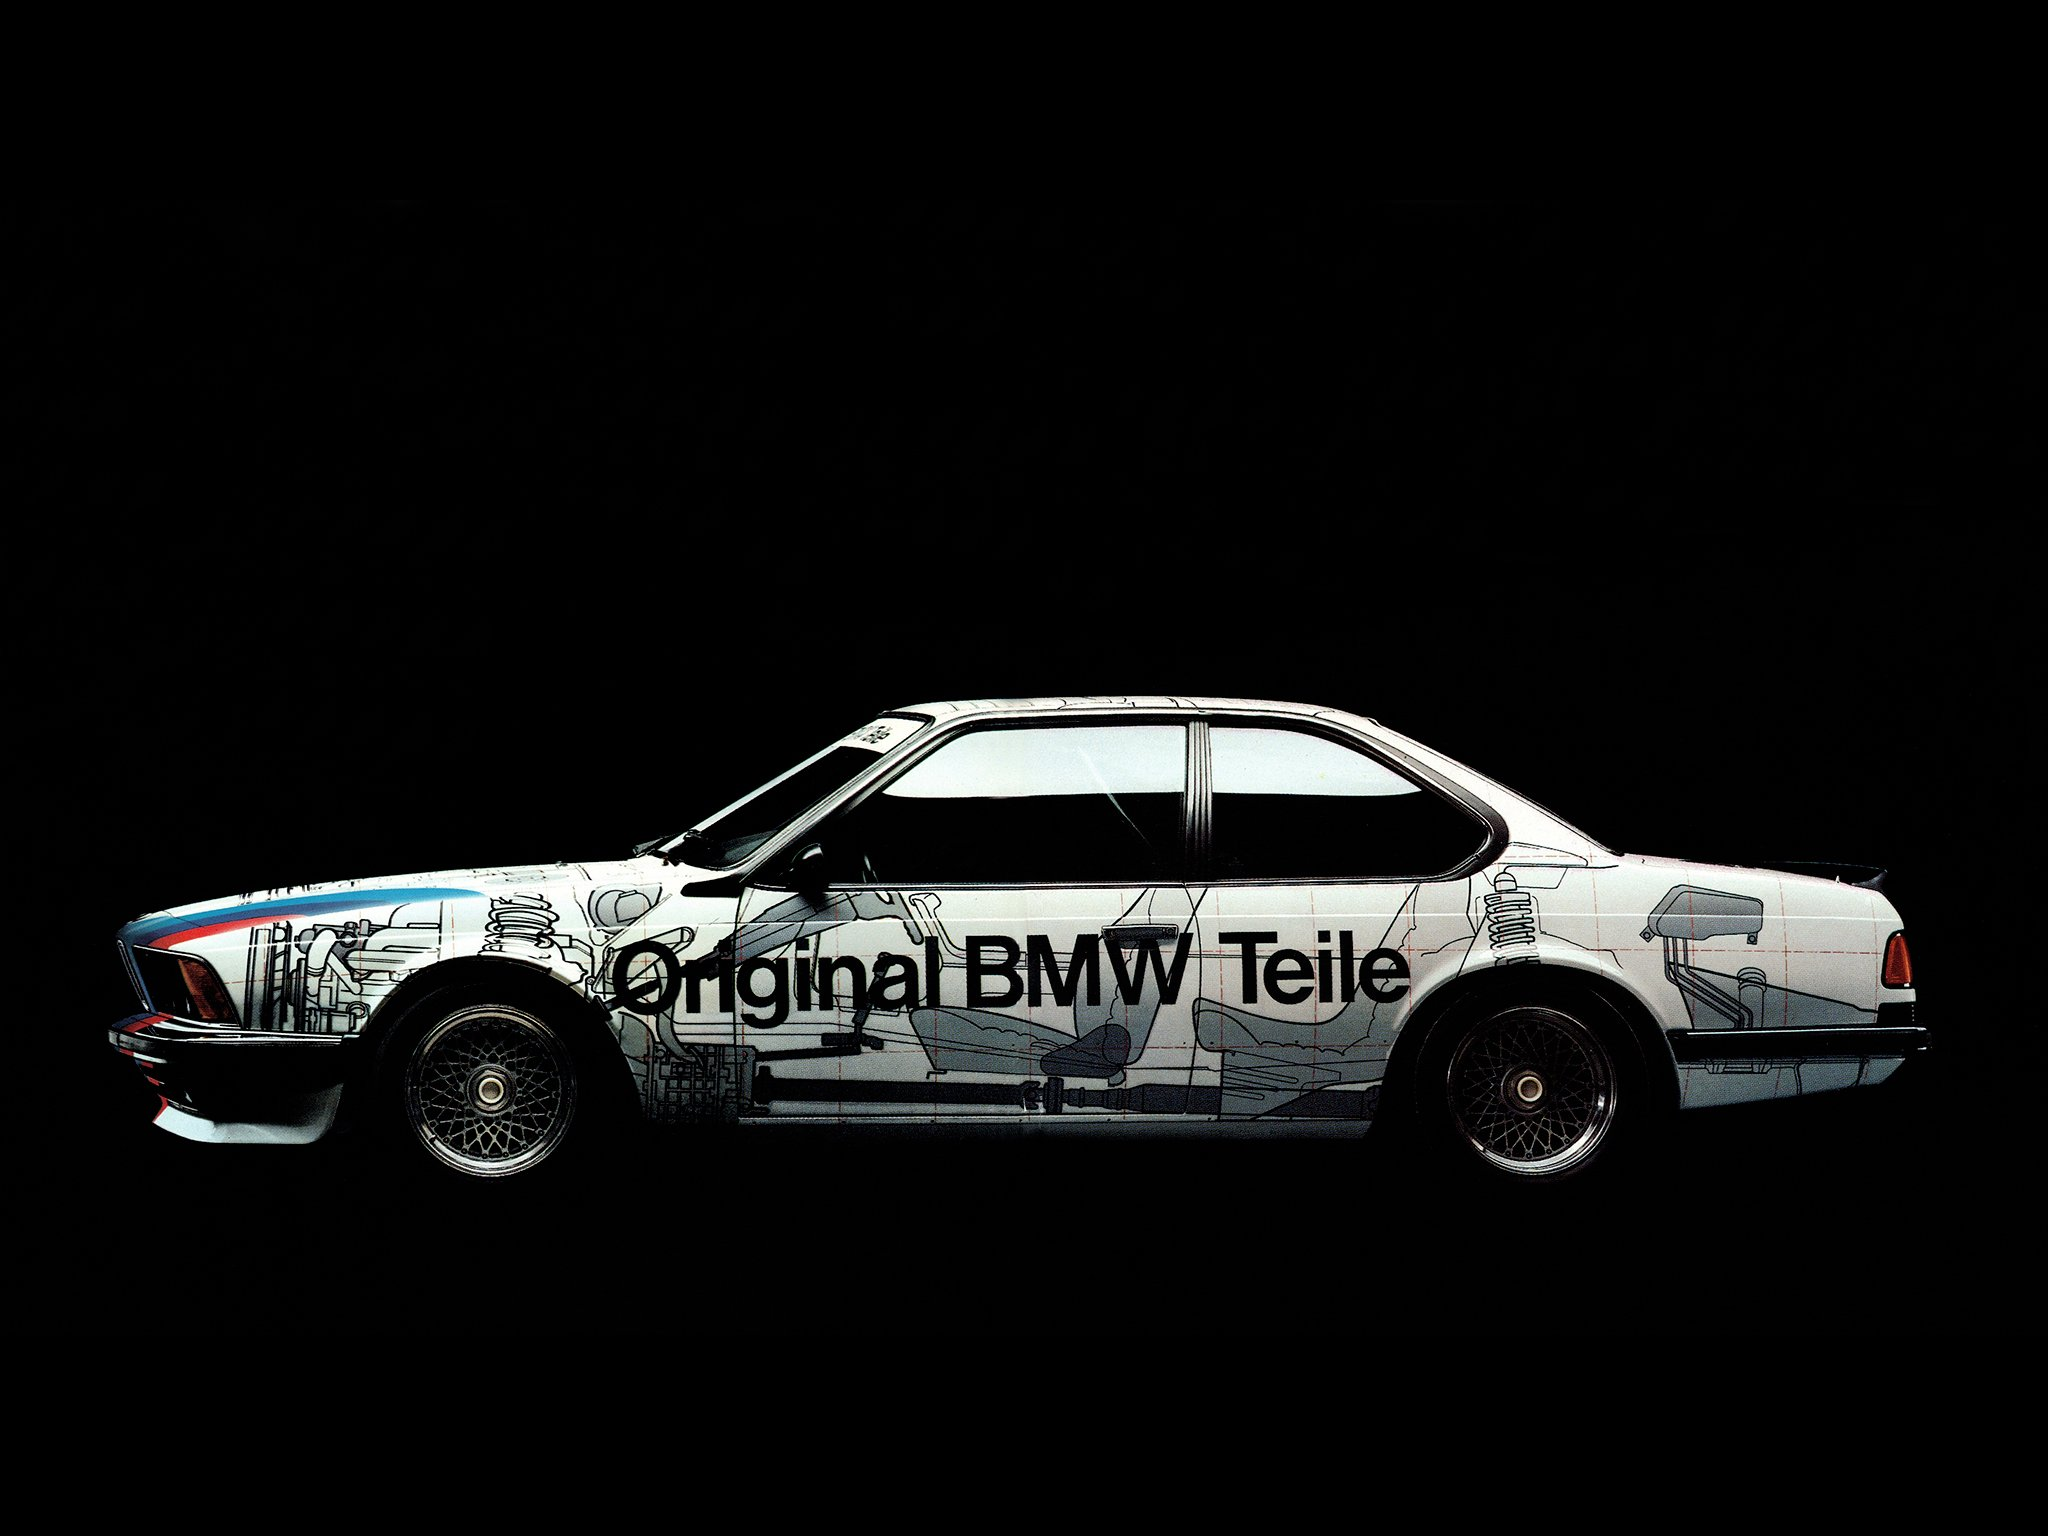 1986 BMW 635 CSi ETCC (E24) race racing tuning v wallpaper ...